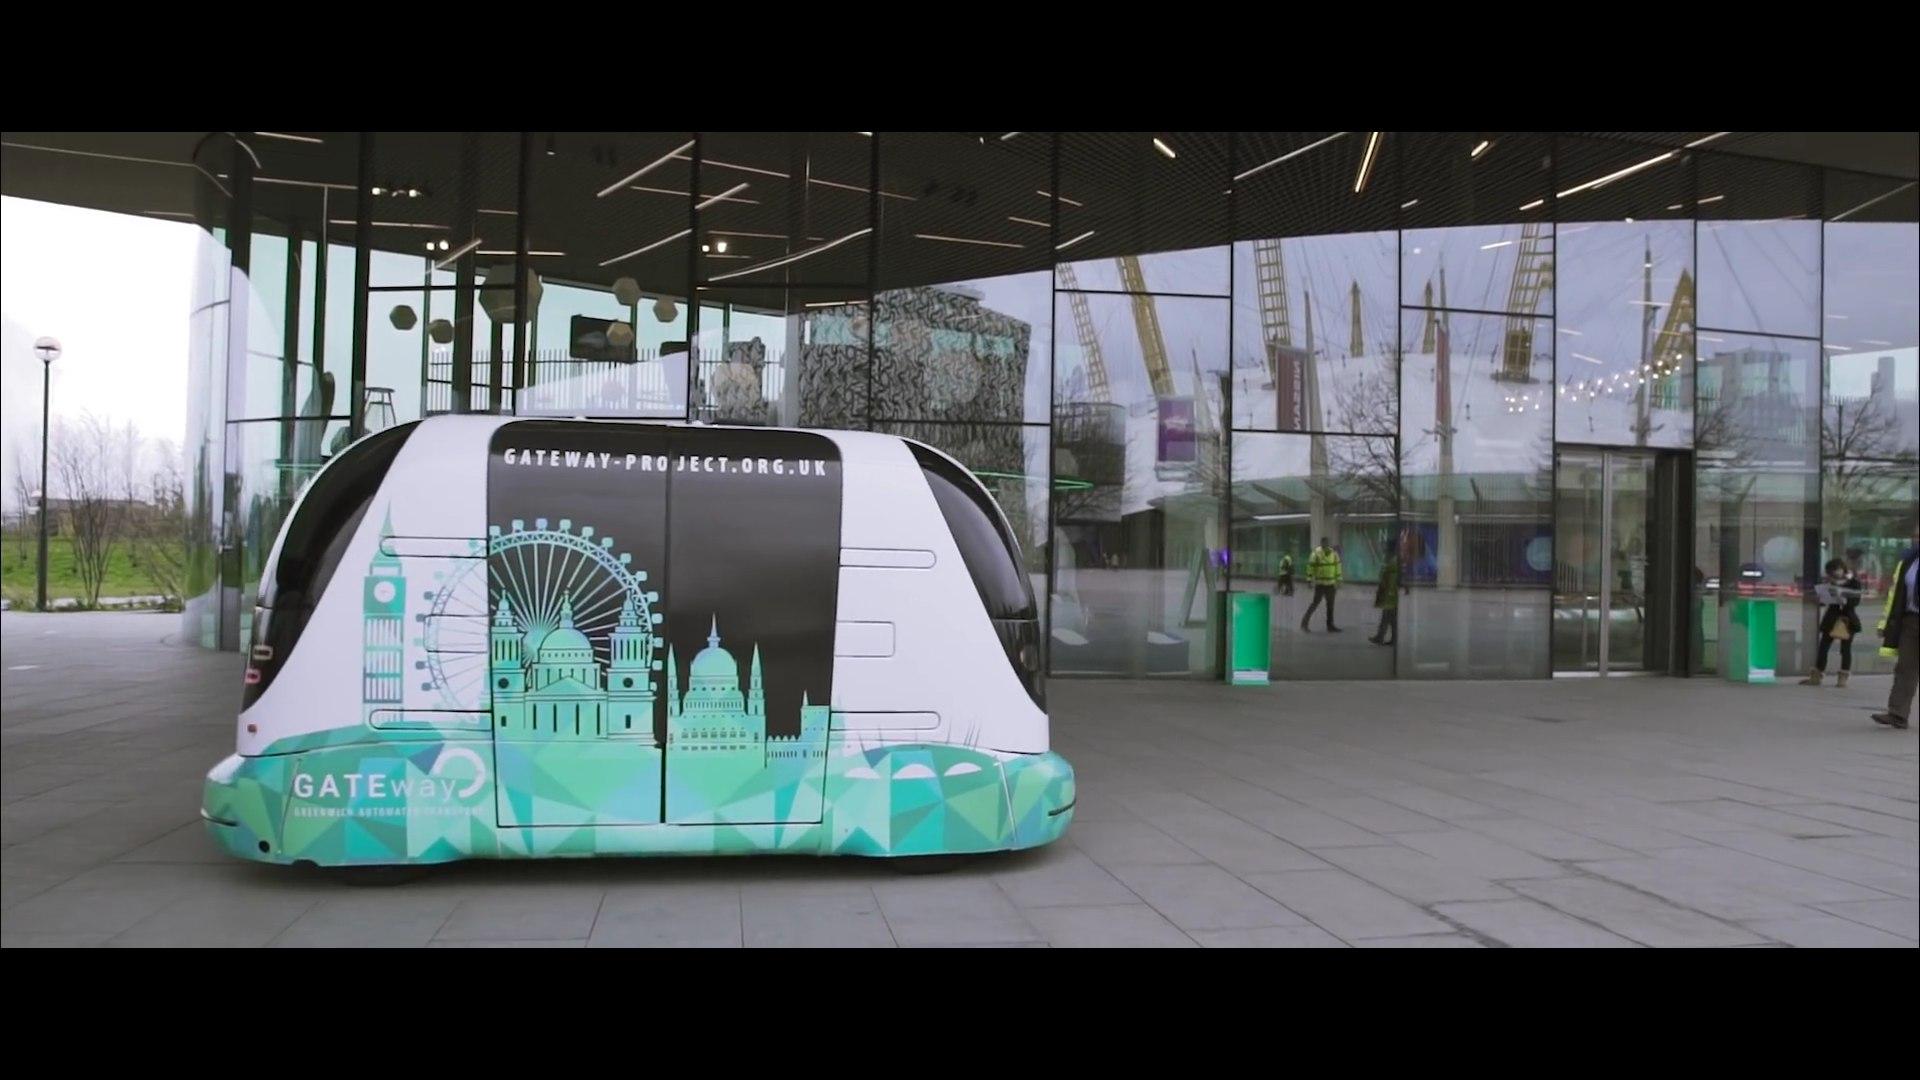 London Self-Driving Vehicles